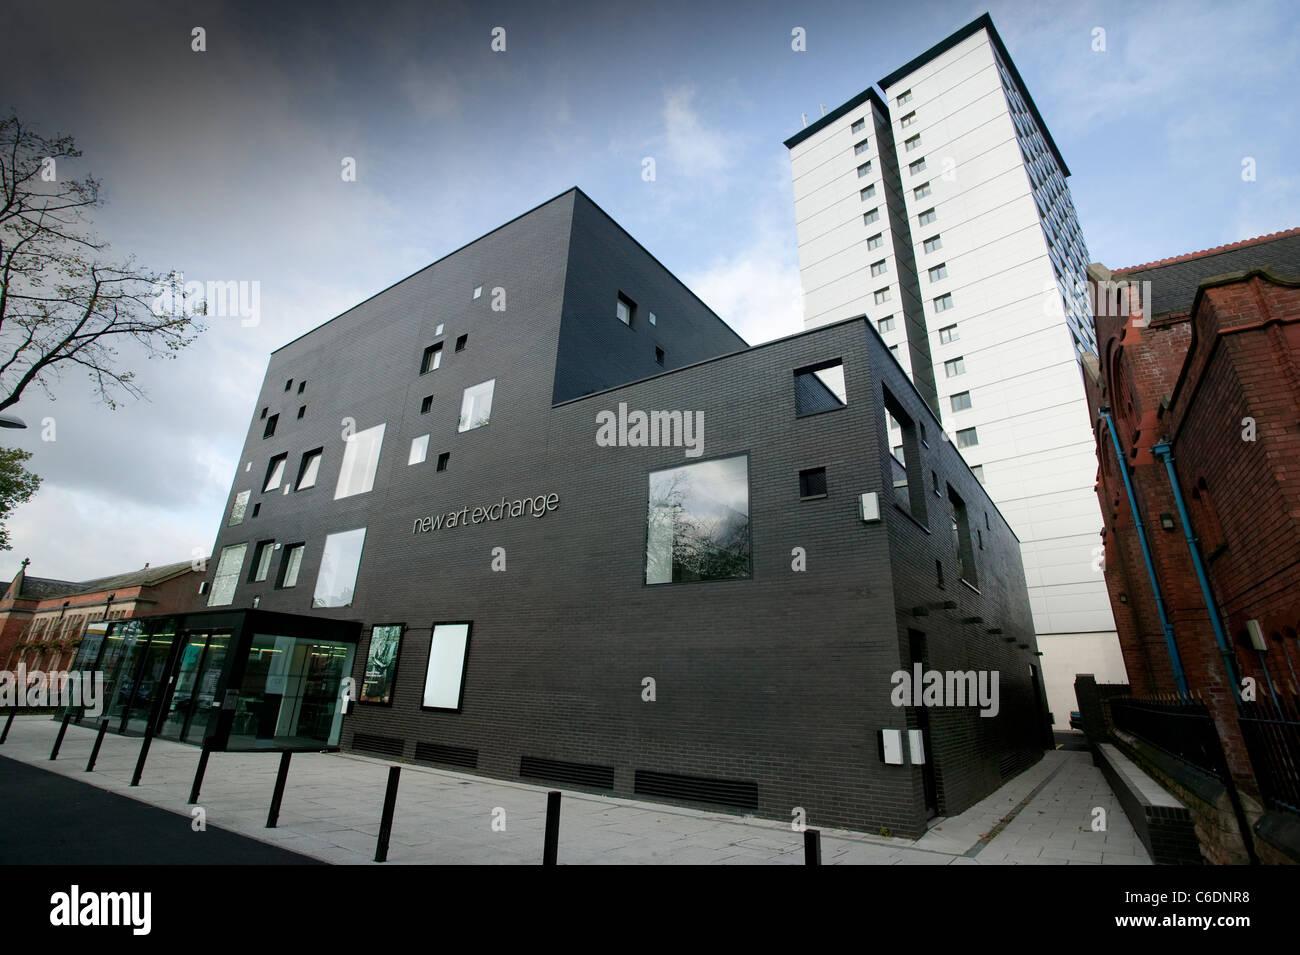 New Art Exchange gallery, Nottingham - Stock Image